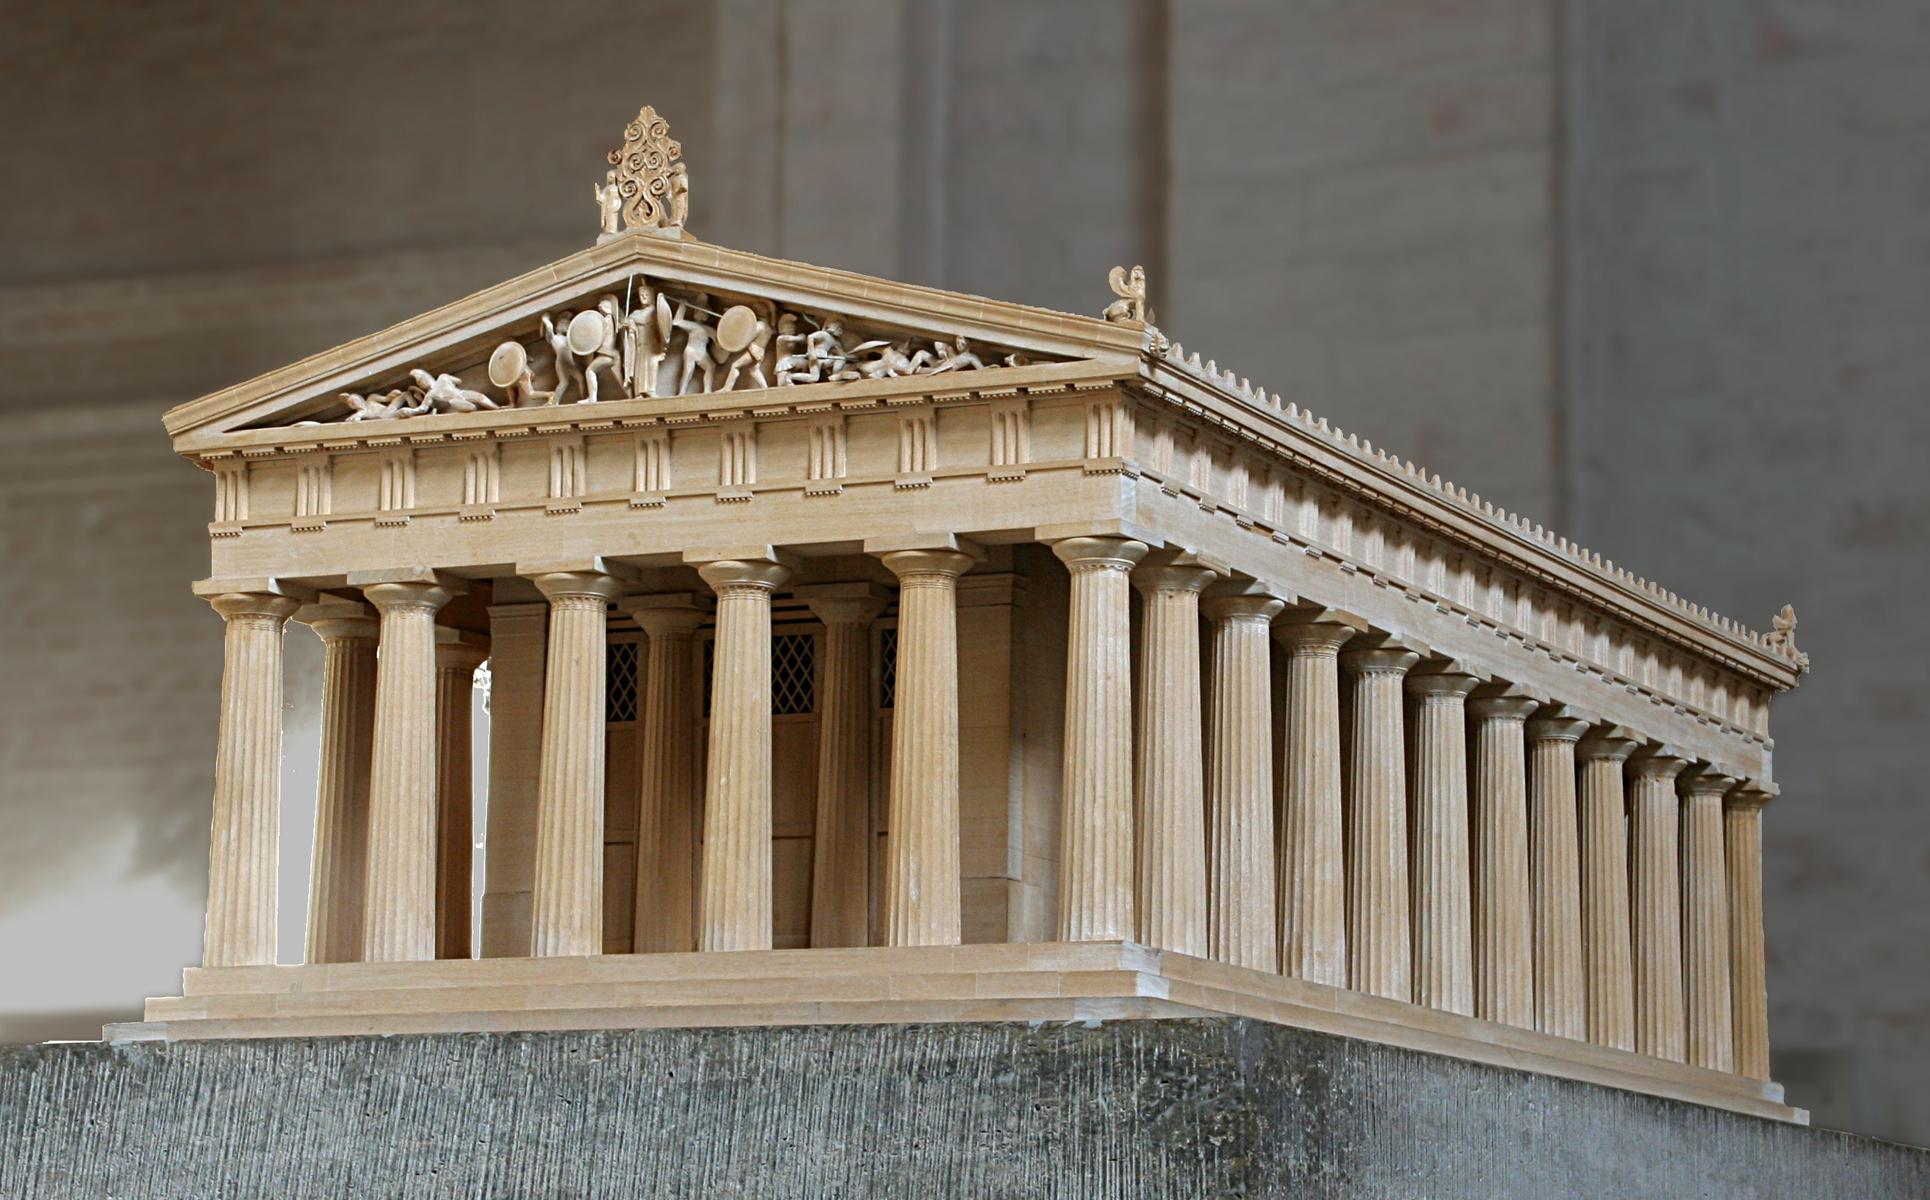 Best Kitchen Gallery: Early Greek Architecture of Greek Architecture  on rachelxblog.com